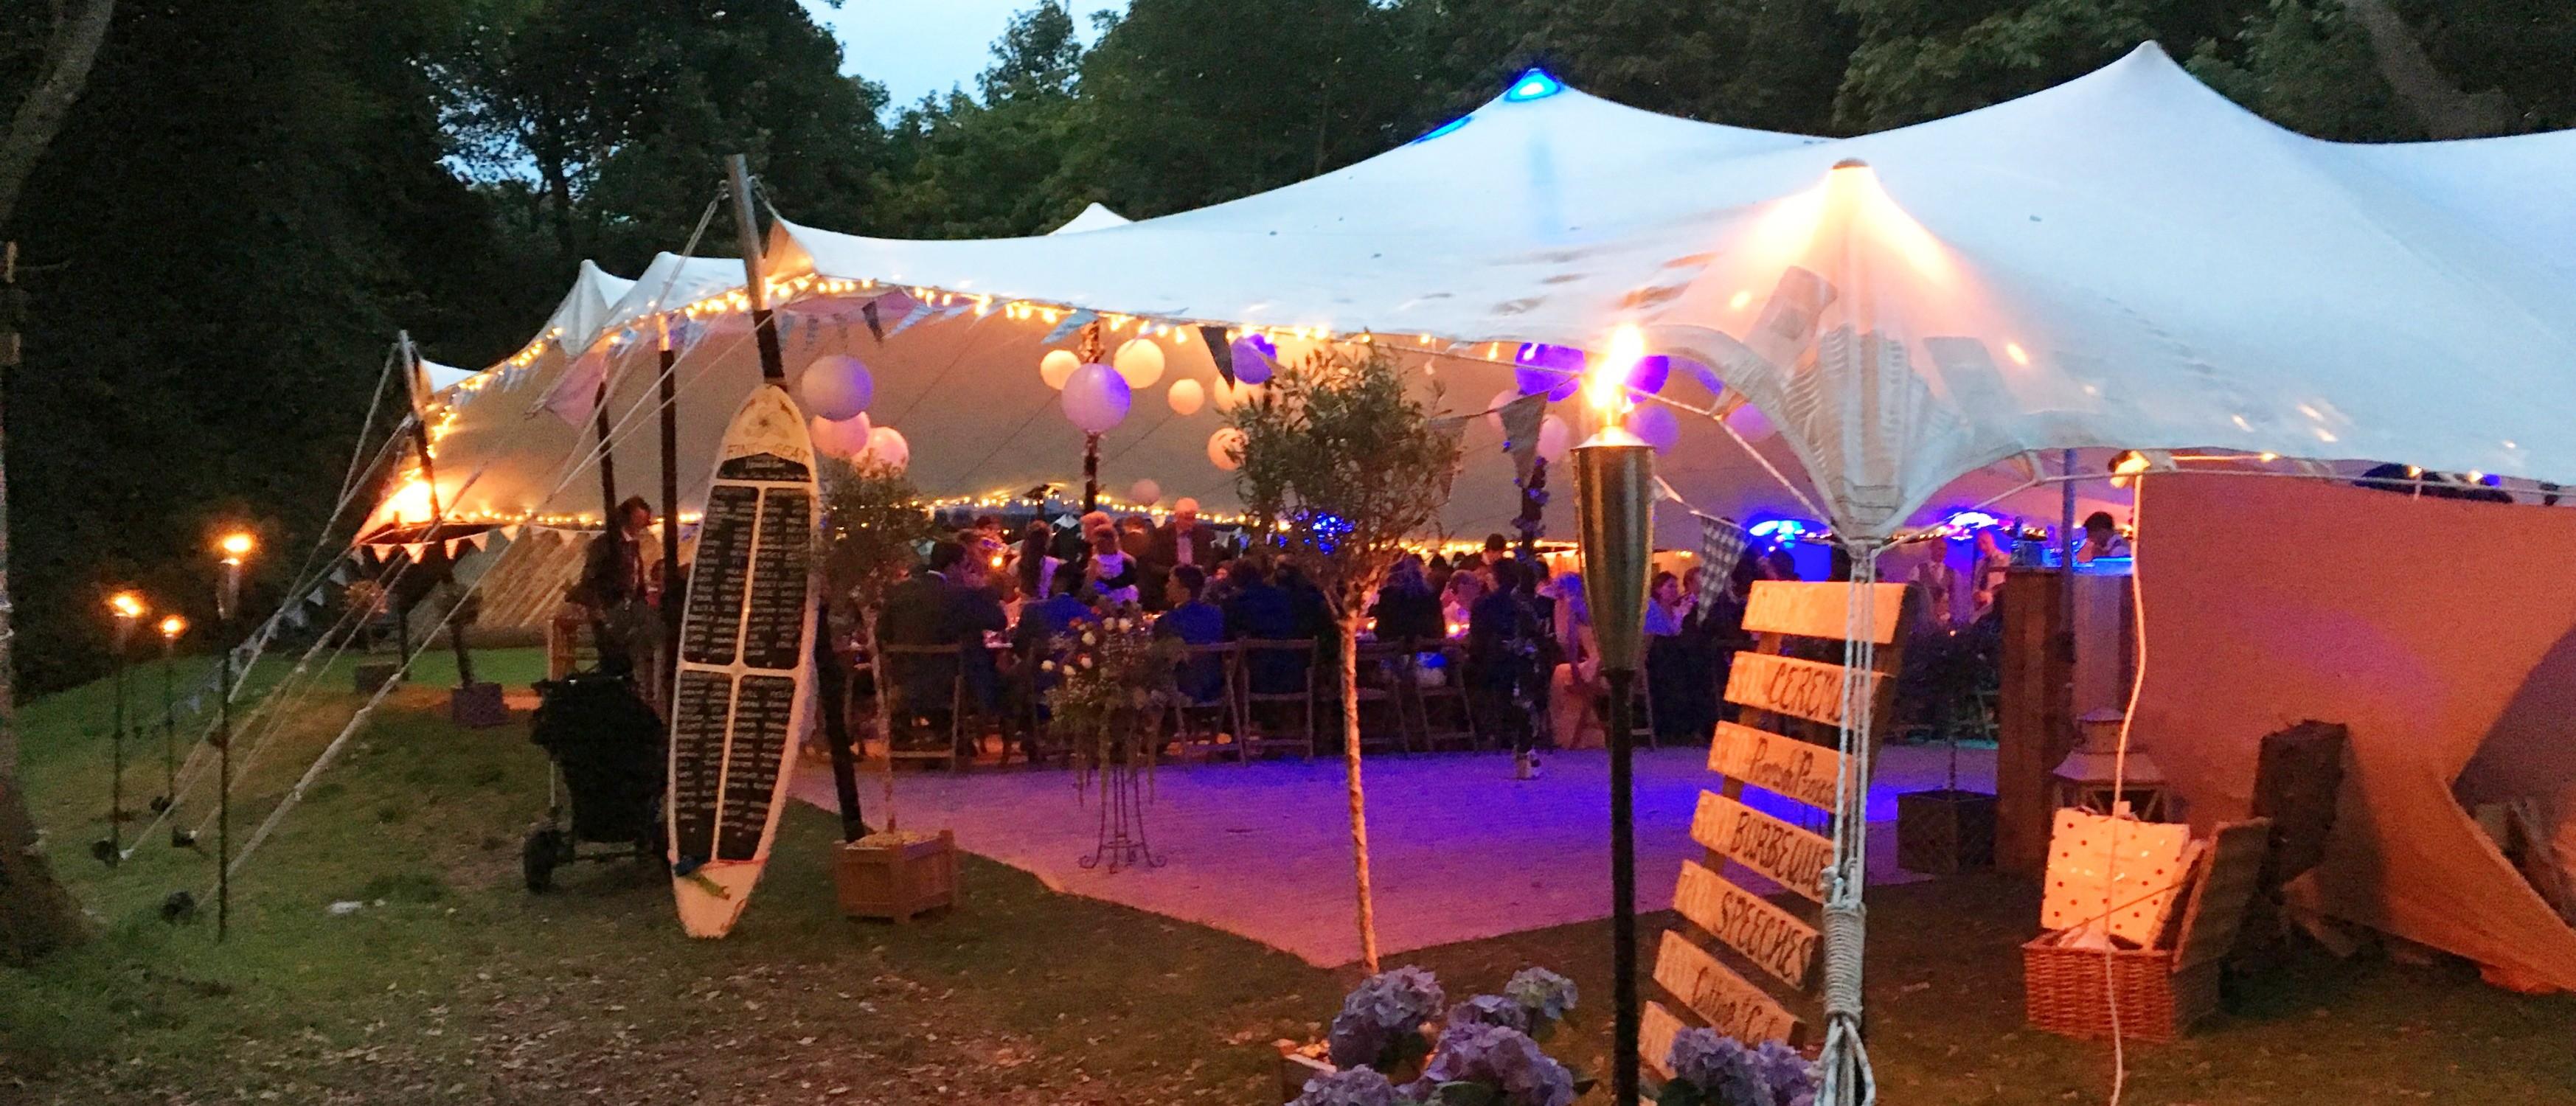 Stretch tent weddings